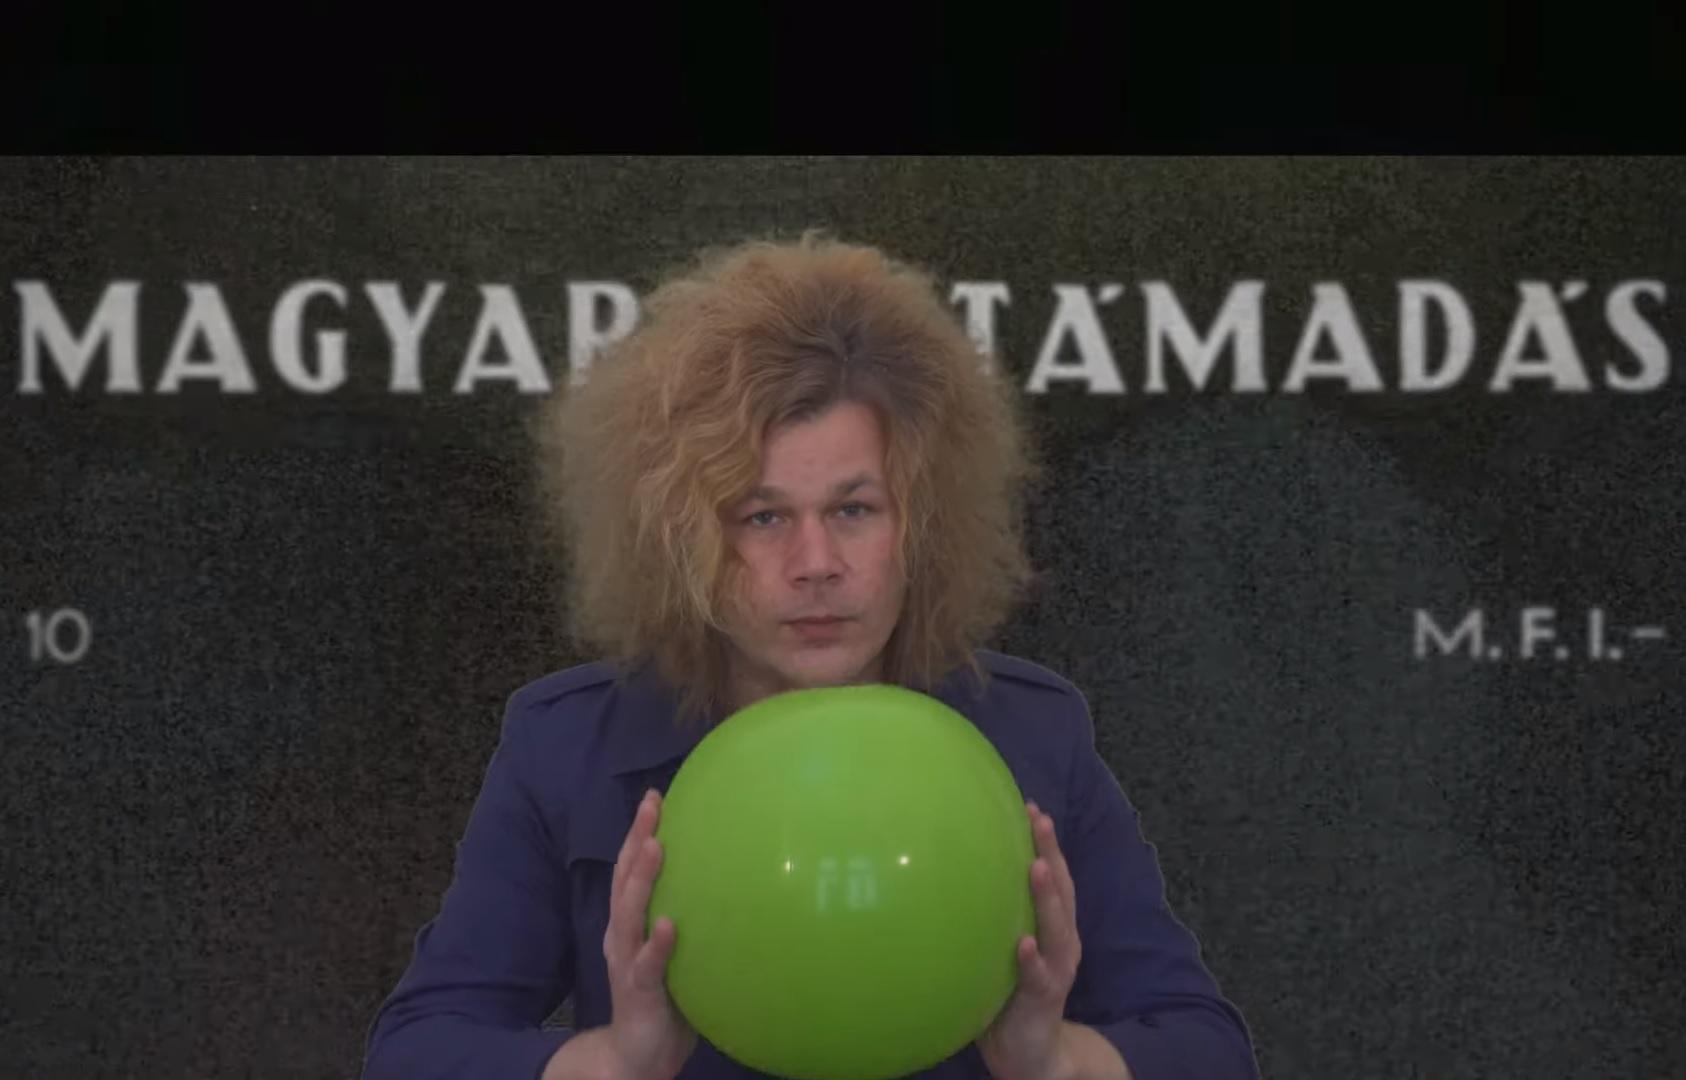 Megjelent a Gustave Tiger új klipje, a Hungaria Aeterna